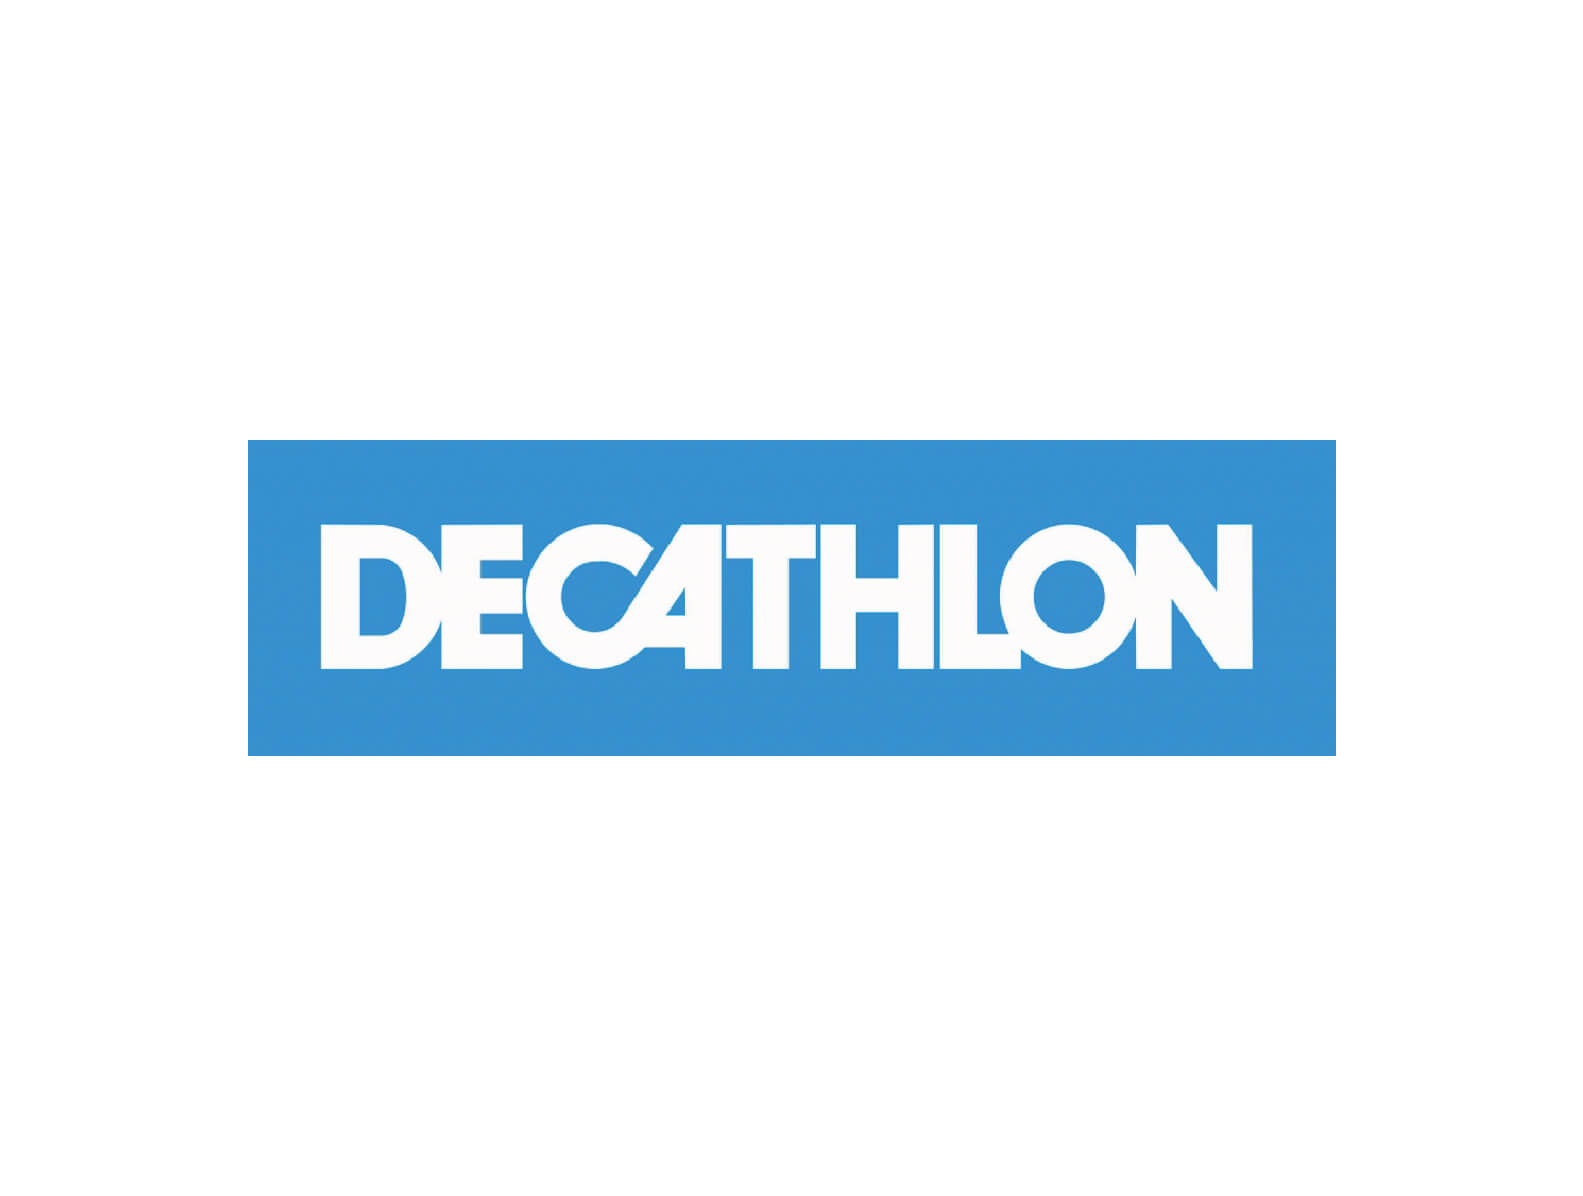 agence kayak communication web lille nord decathlon